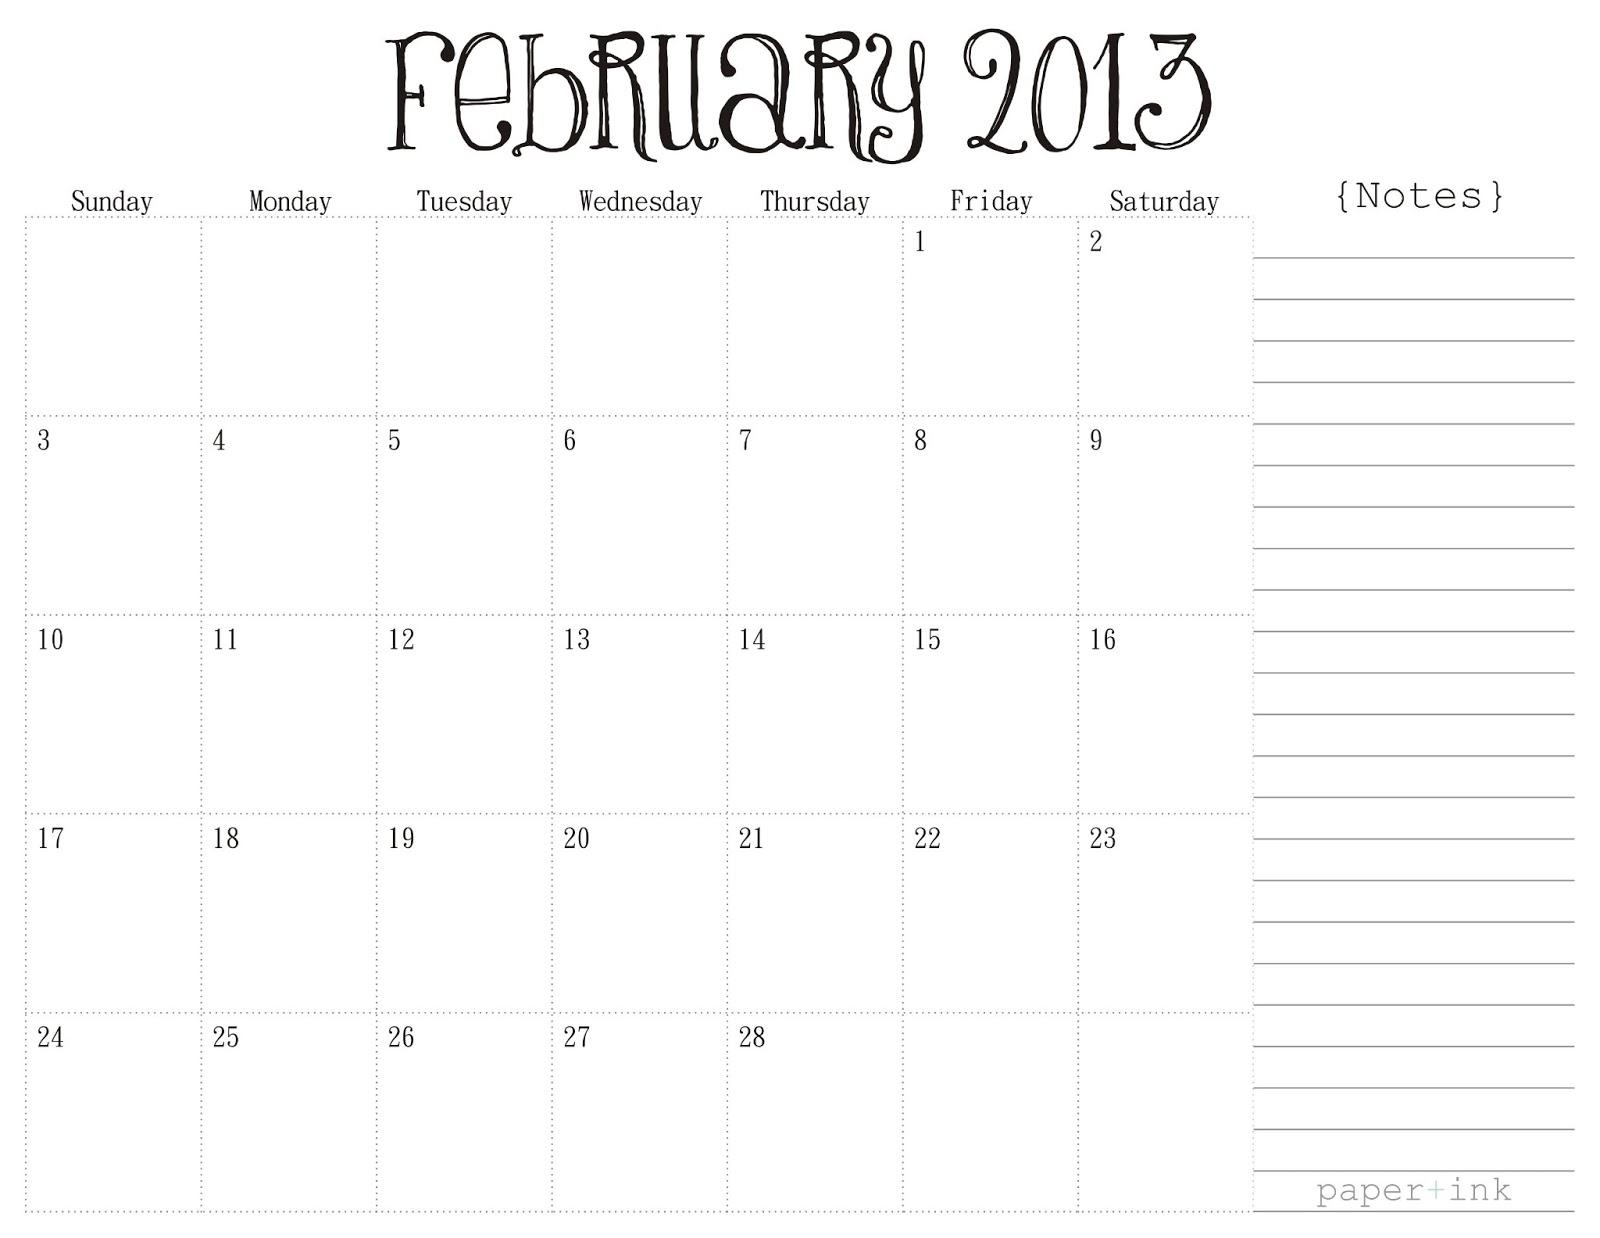 Free Printable Calendars 2013 2014 Black And White